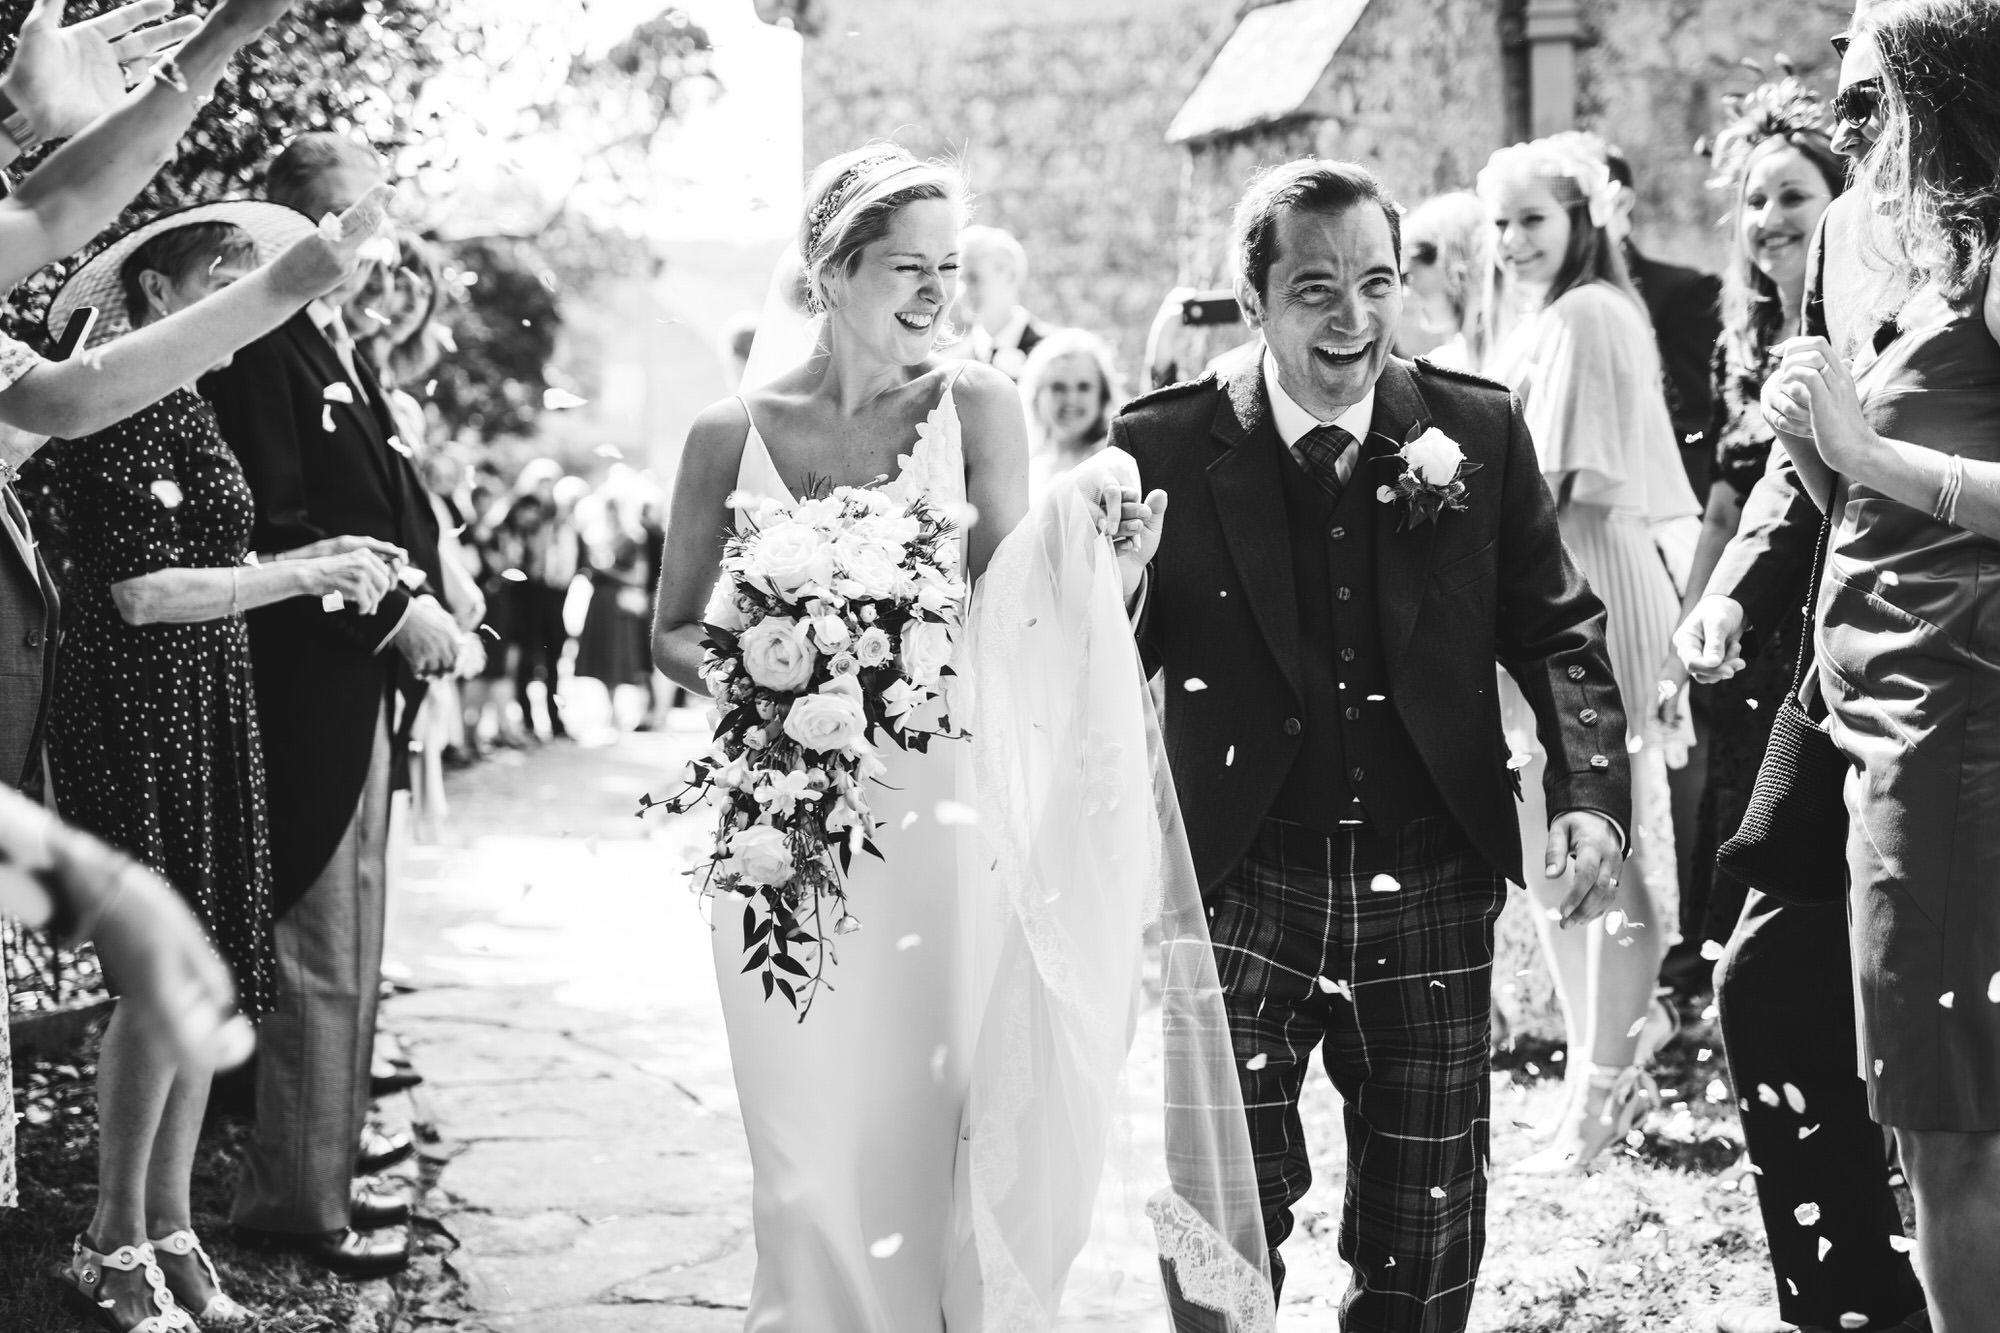 Dorset marquee wedding by the sea simon biffen photography 20